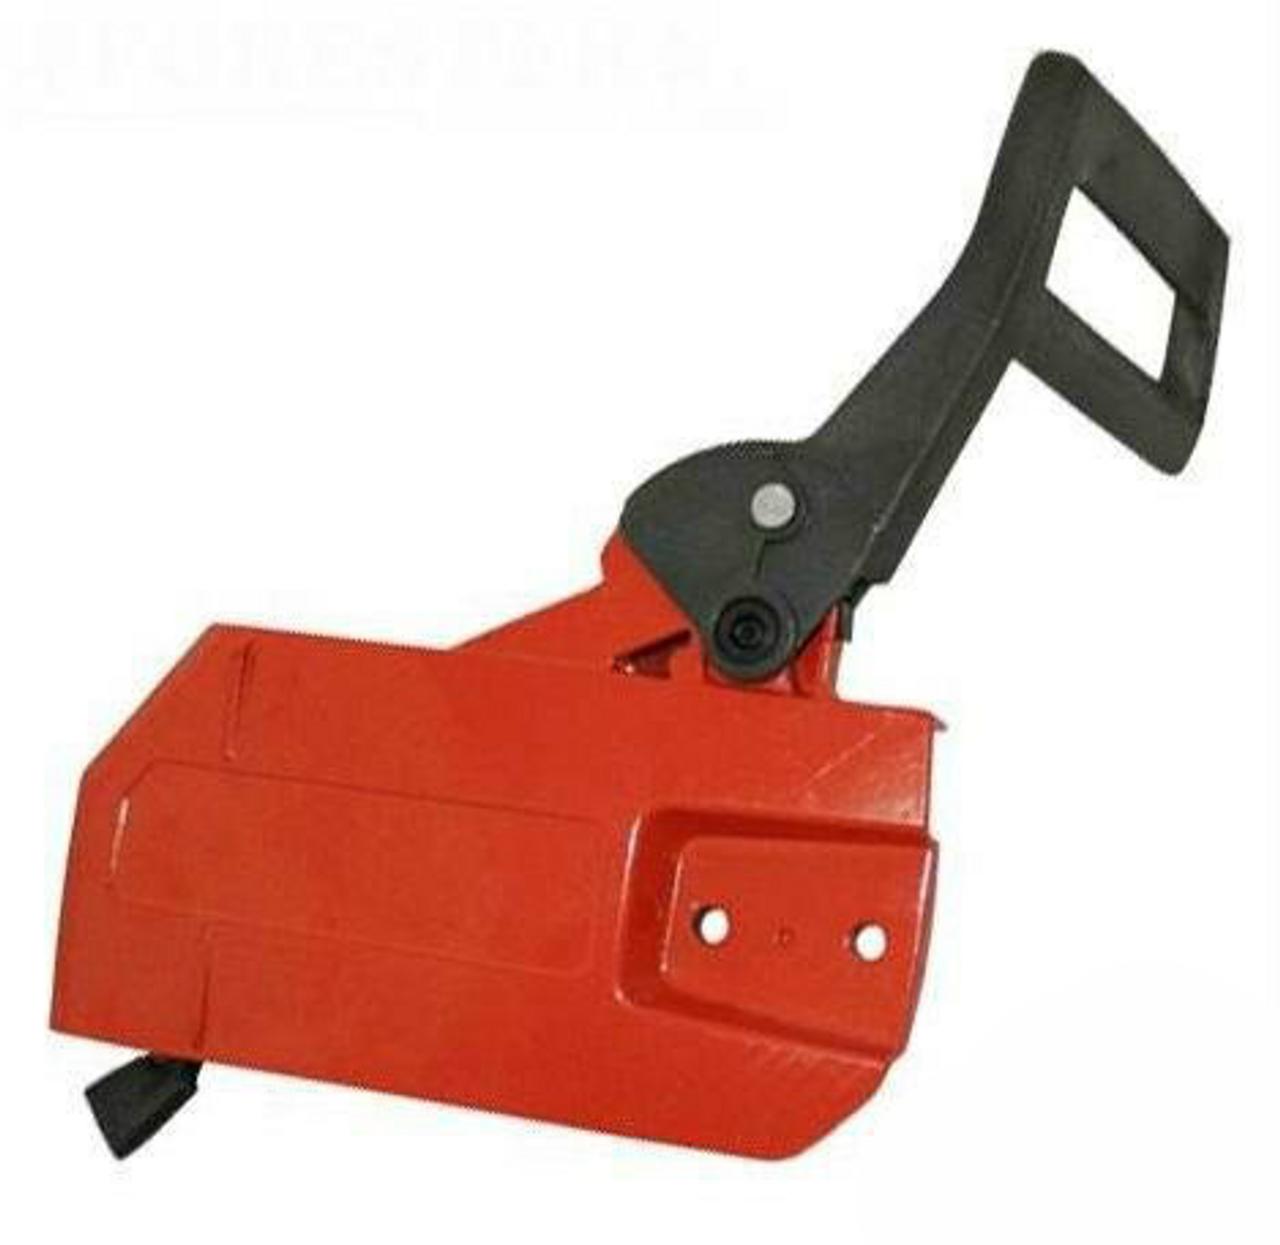 Part Husqvarna 530029850 Chainsaw Chain Brake Assembly Genuine Original Equipment Manufacturer OEM